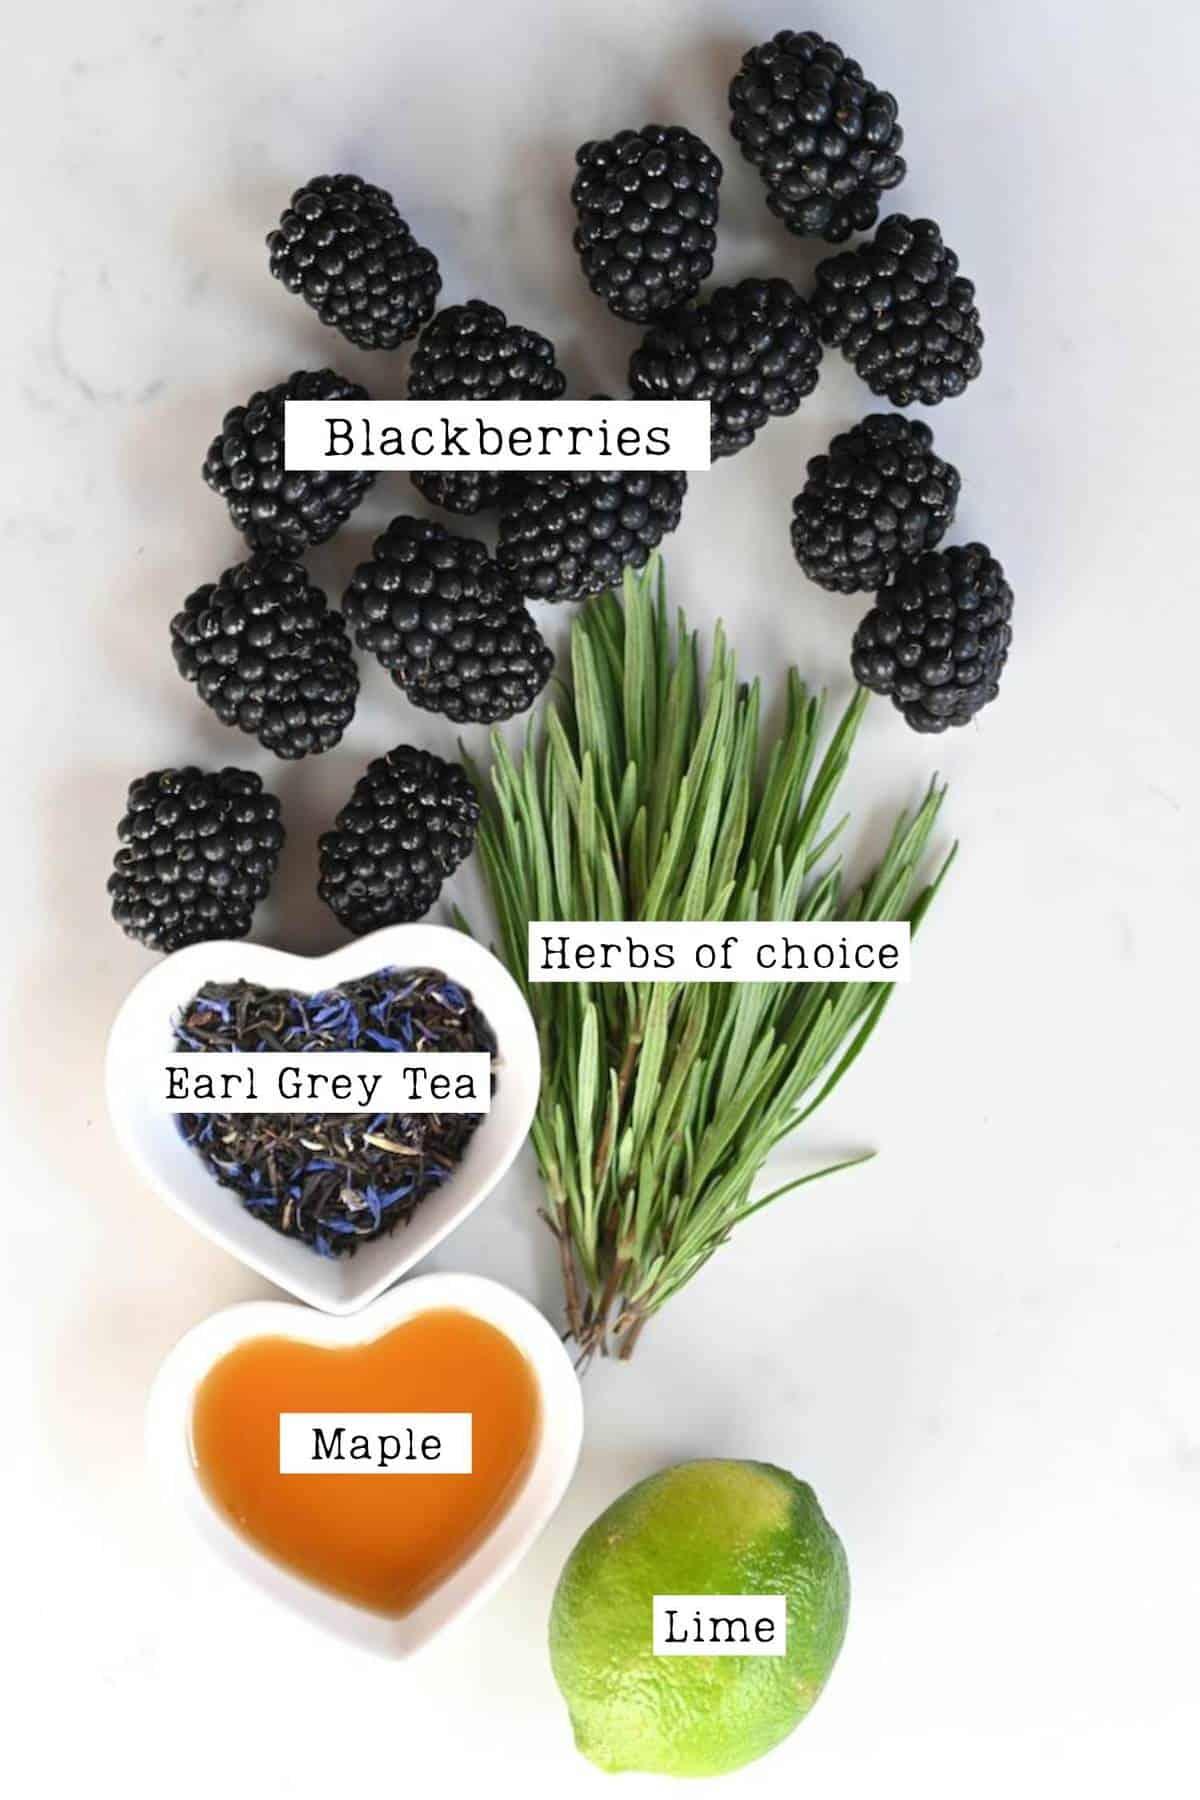 ingredients to make blackberry iced tea